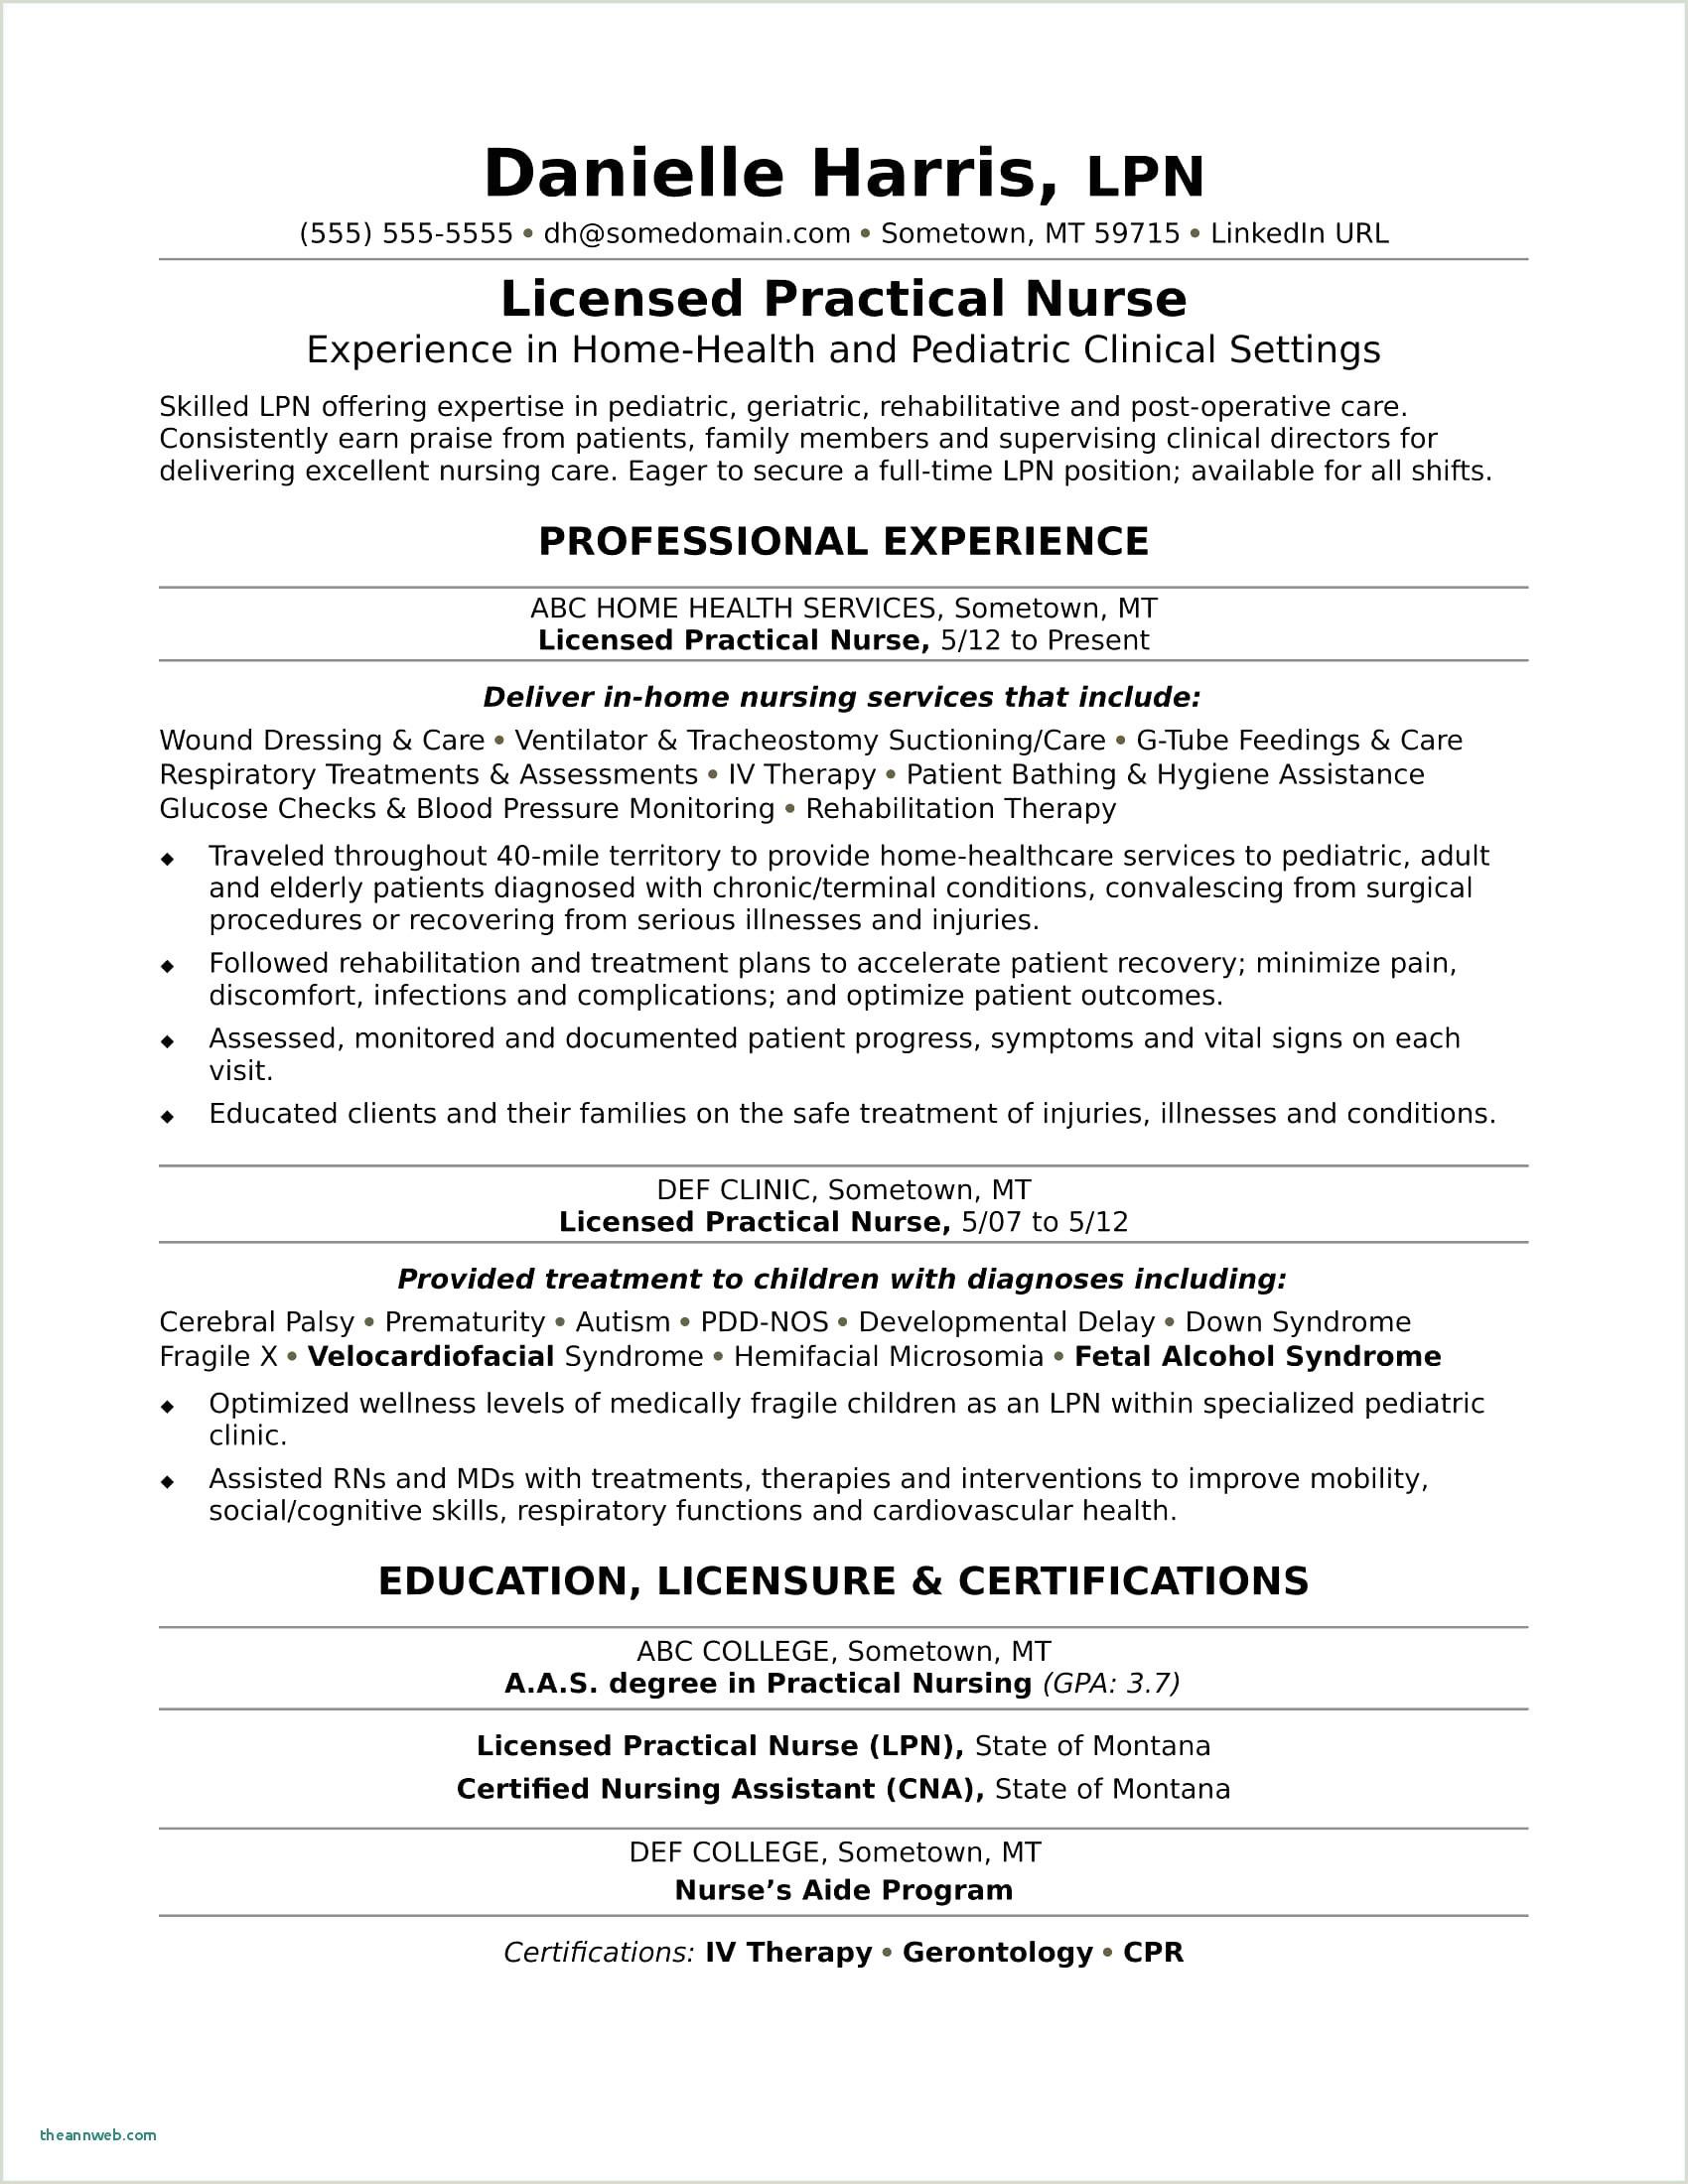 Entry Level Esthetician Resume No Experience Unique Esthetician Resume – Crazywind – Linuxgazette